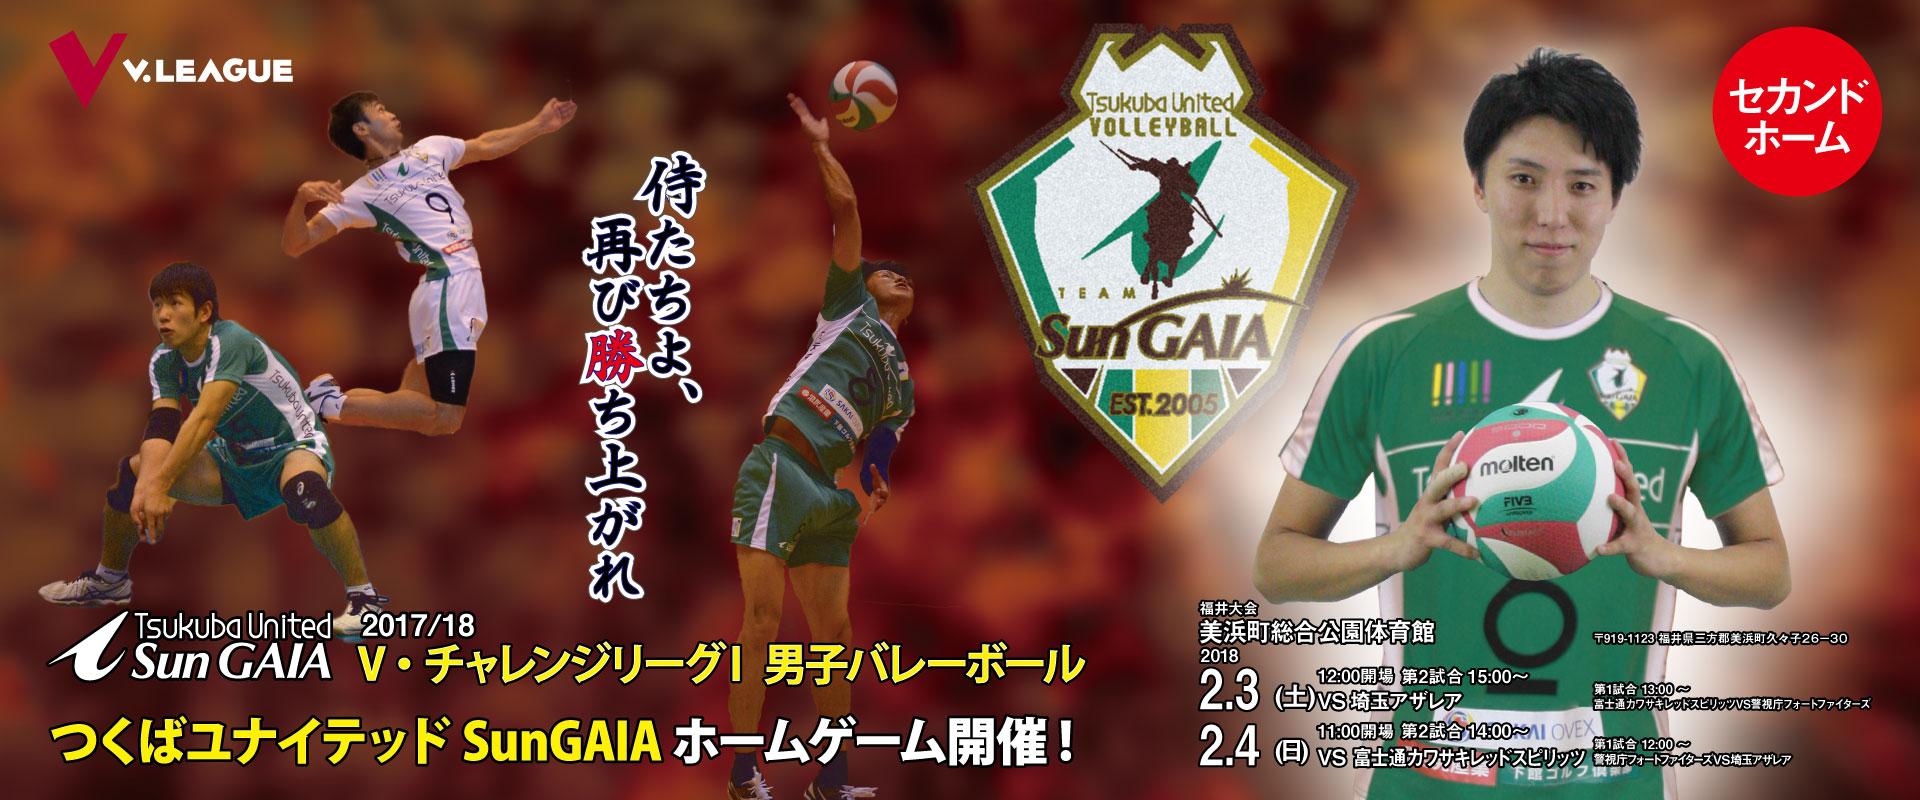 2017/18 V・チャレンジリーグⅠ 男子バレーボール 福井大会